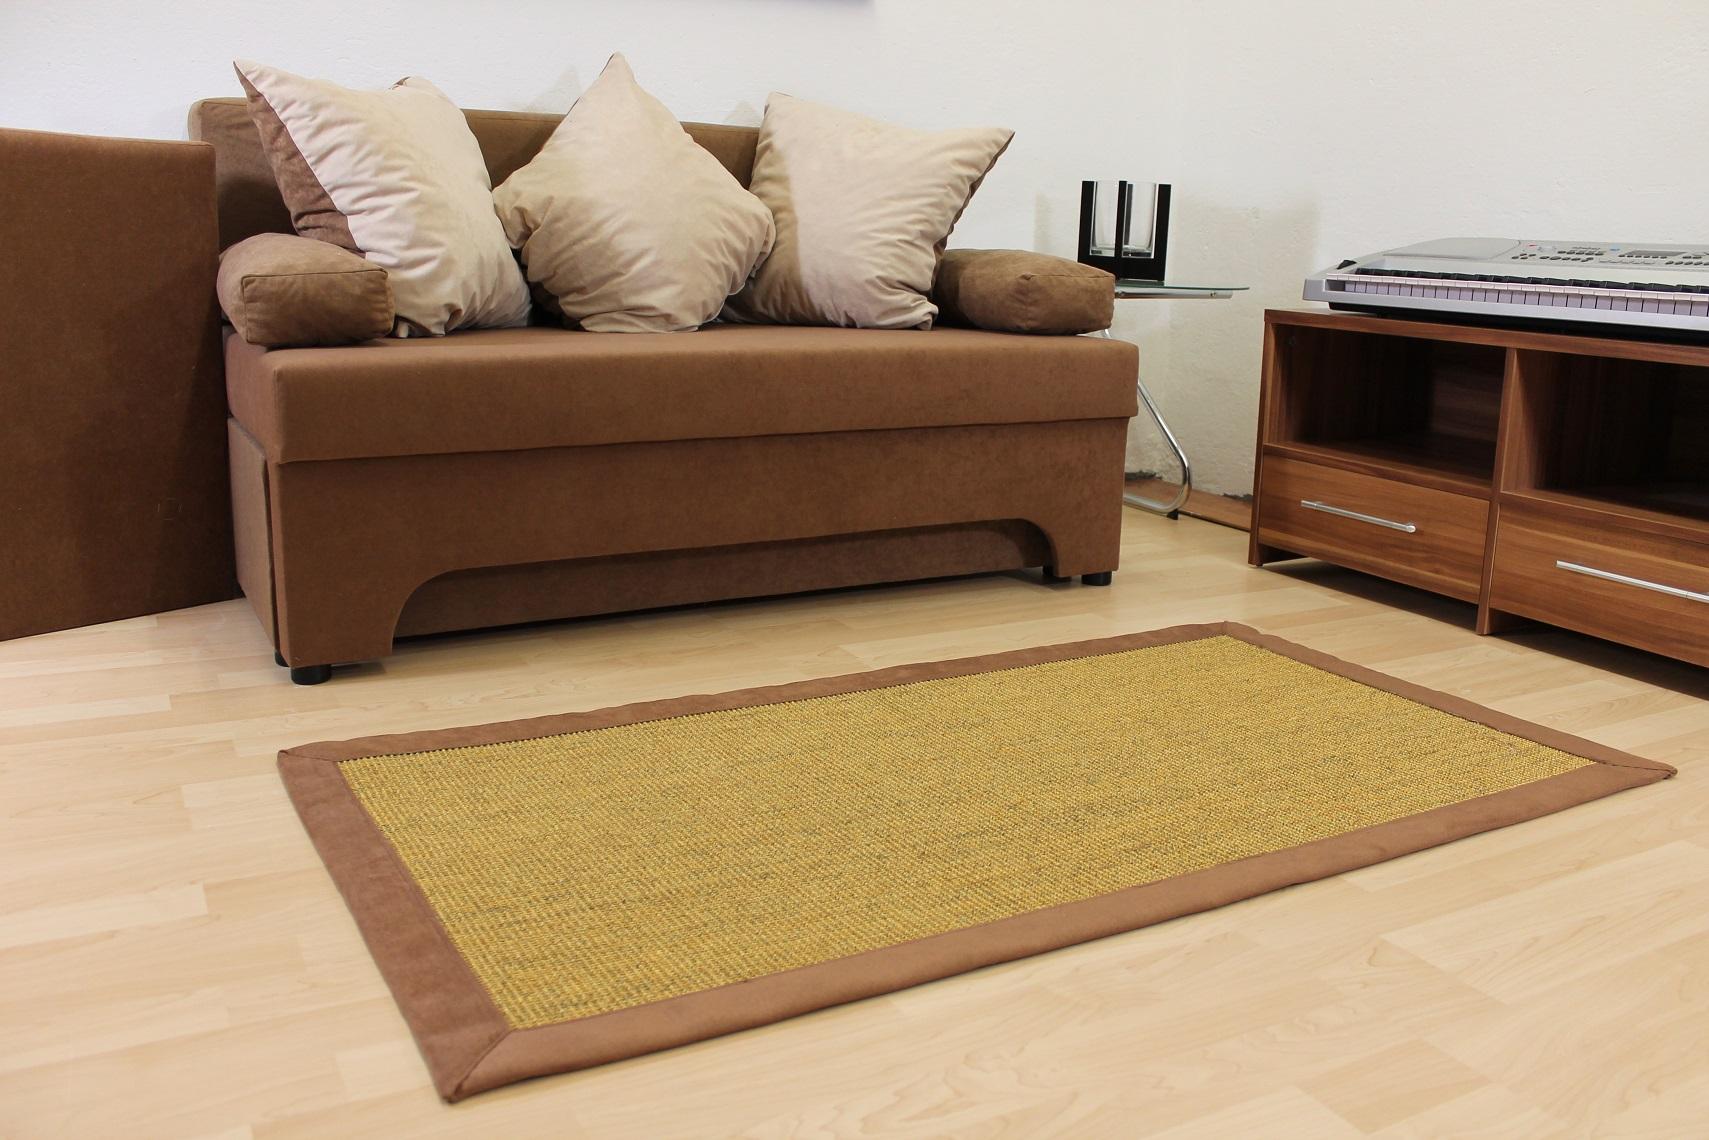 Teppichkiste  Sisal Teppich Braun Nussfarbe 70 x 135 cm